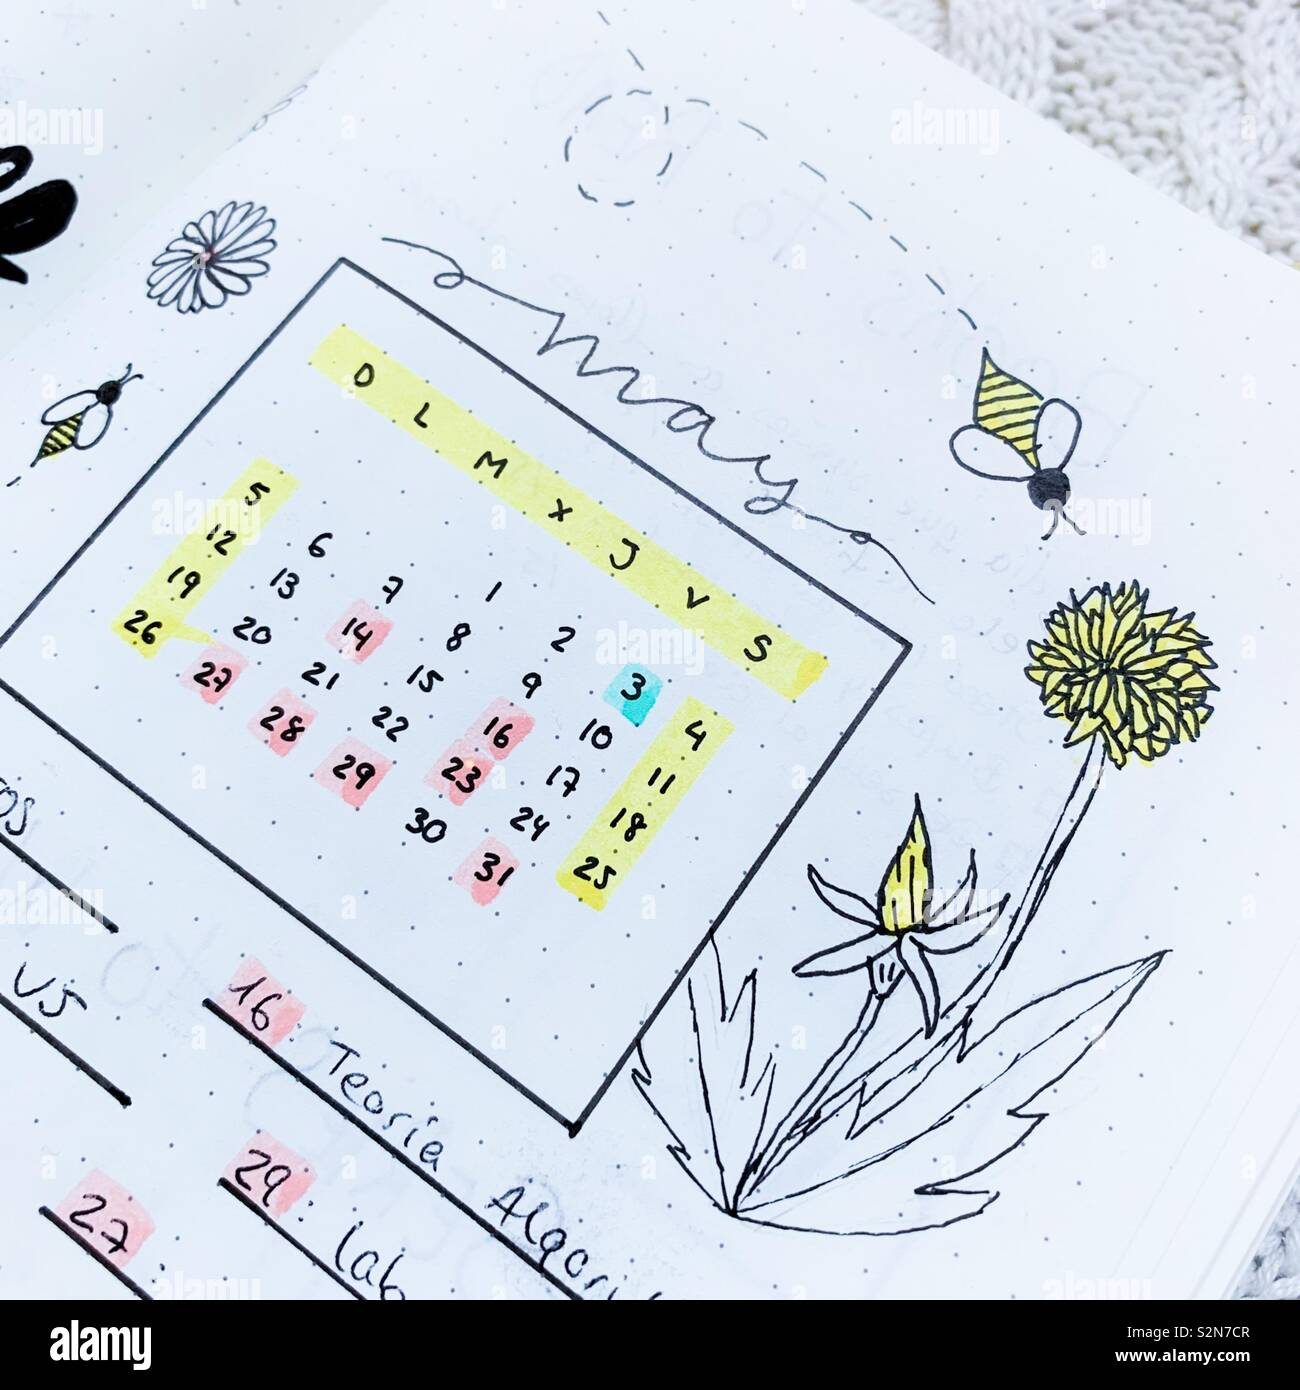 Calendrier 2019 Bullet Journal.May Calendar Bullet Journal Stock Photo 311482775 Alamy